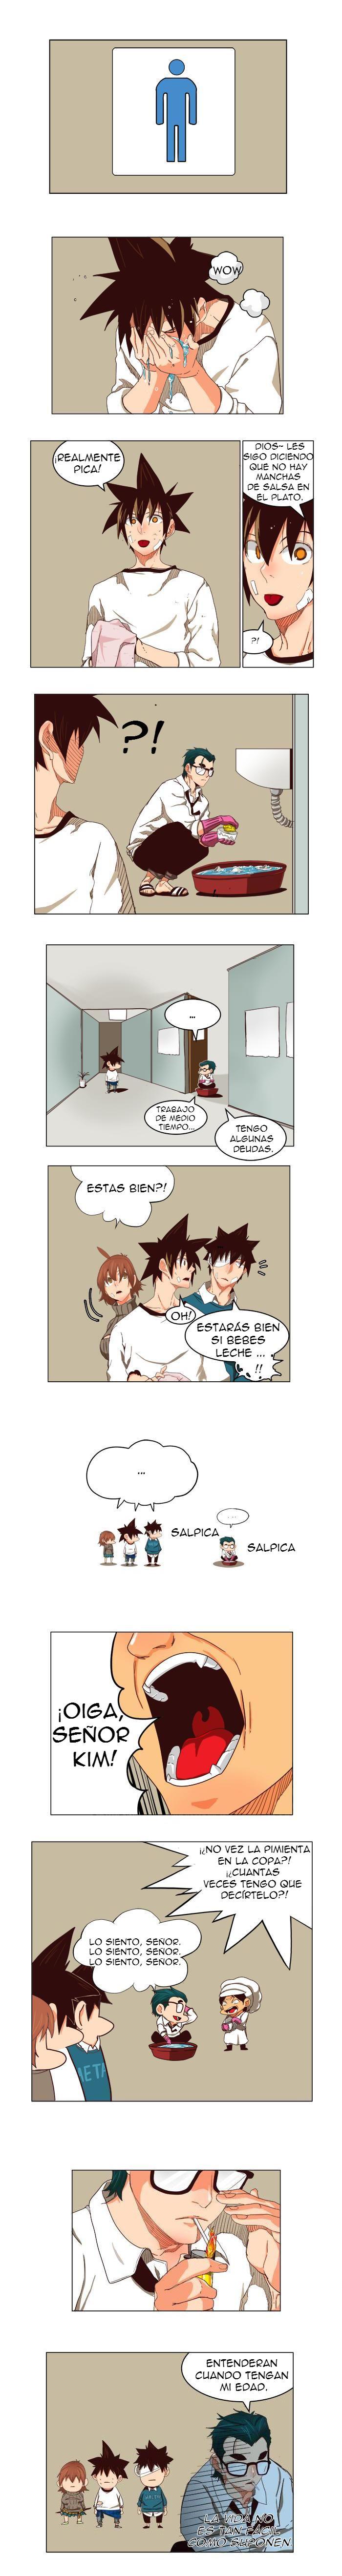 http://c5.ninemanga.com/es_manga/37/485/436626/8ab70731b1553f17c11a3bbc87e0b605.jpg Page 1